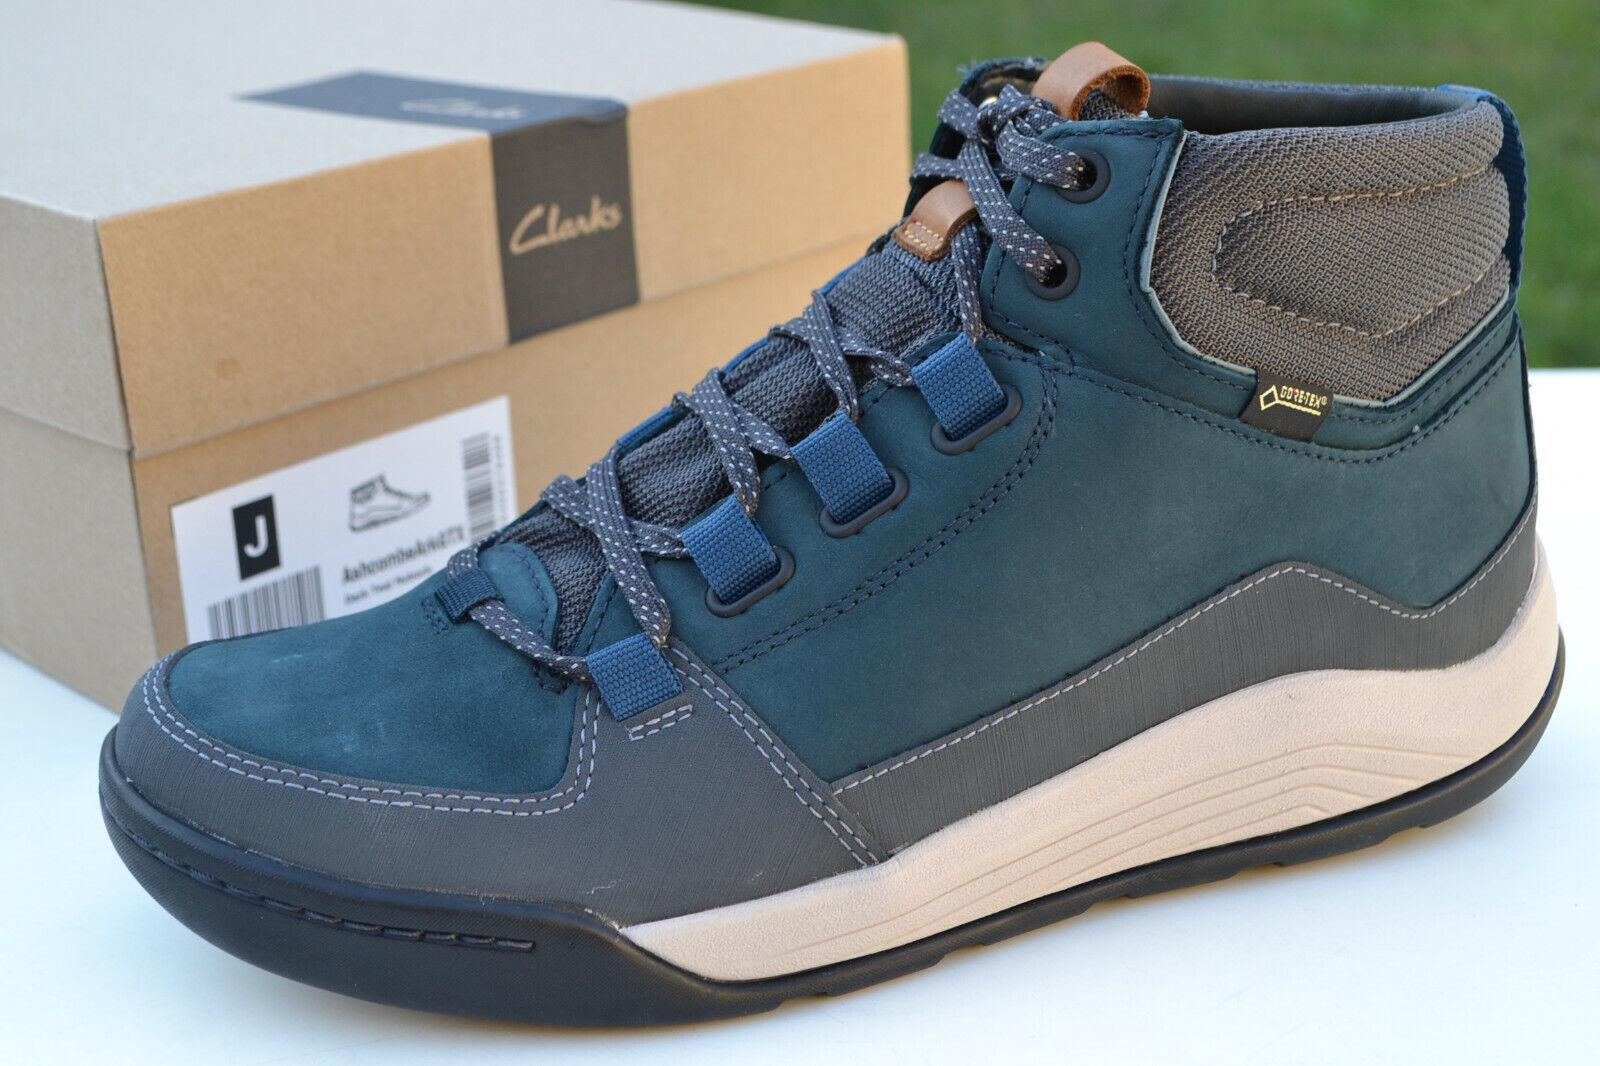 Clarks BNIB Mens Walking Hiking Boots ASHCOMBE ARK GTX Dark Teal Leather UK 12